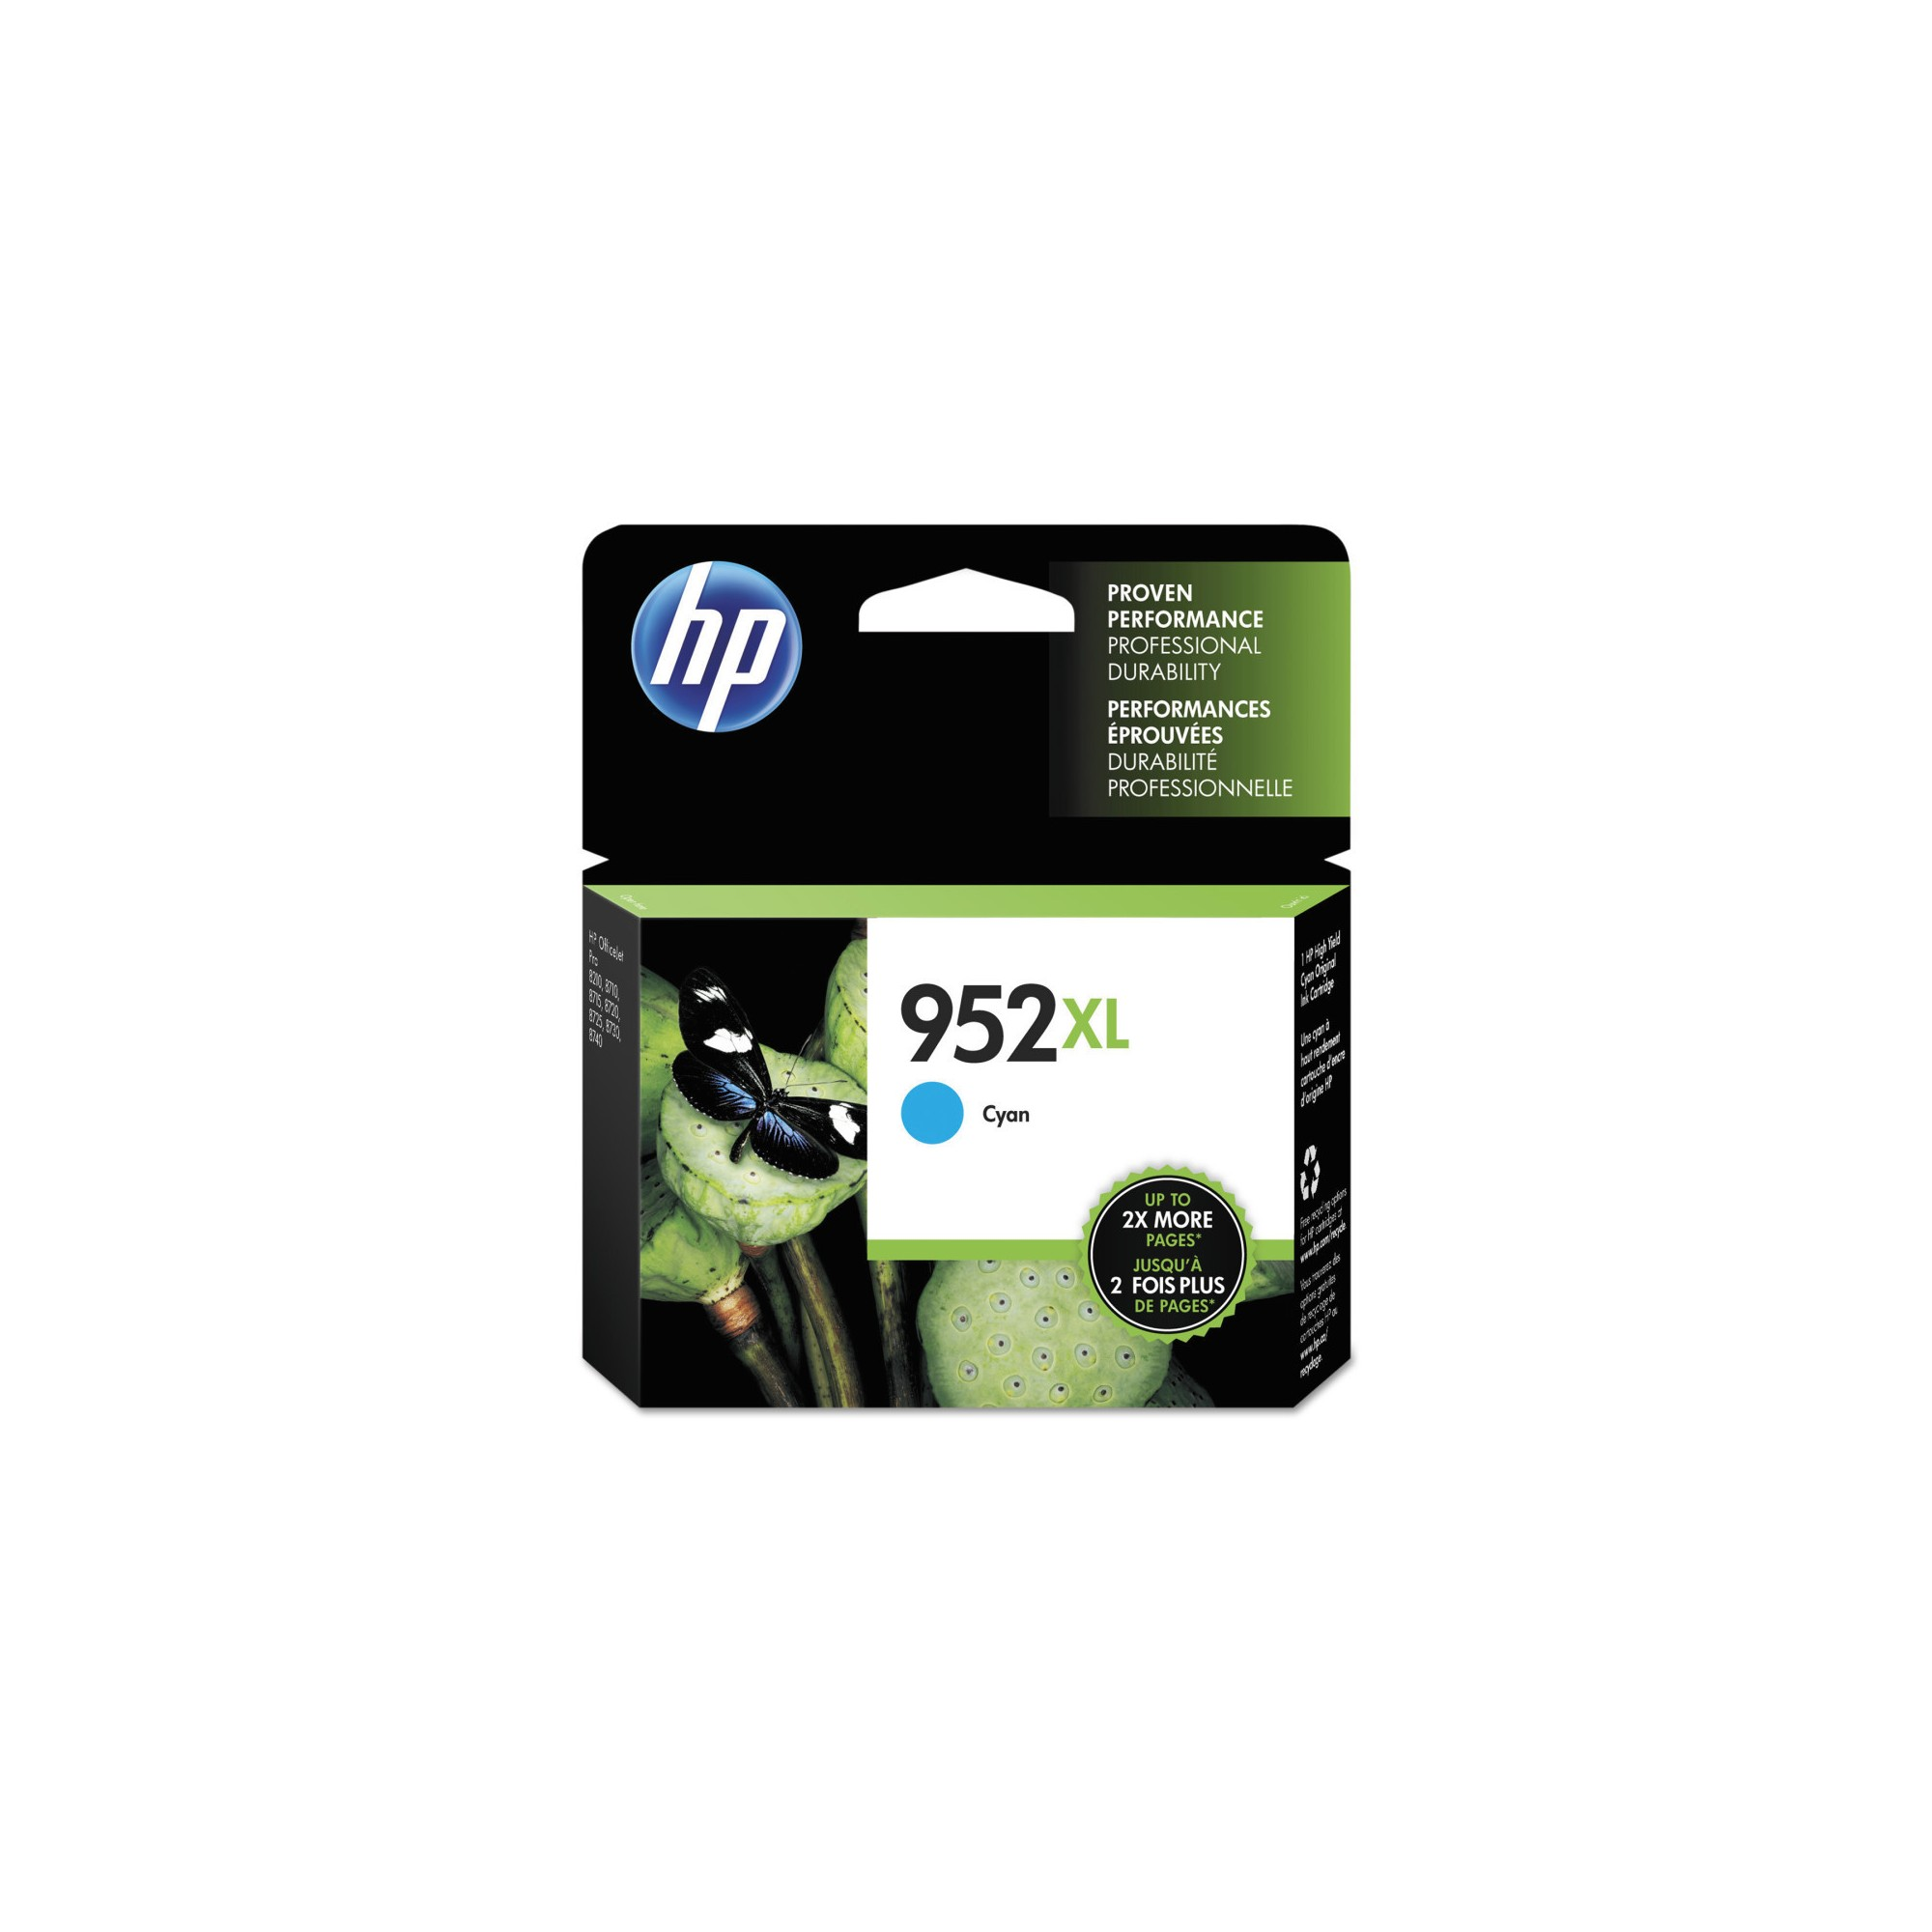 Hp 952xl High Yield Original Single Ink Cartridge Cyan Blue